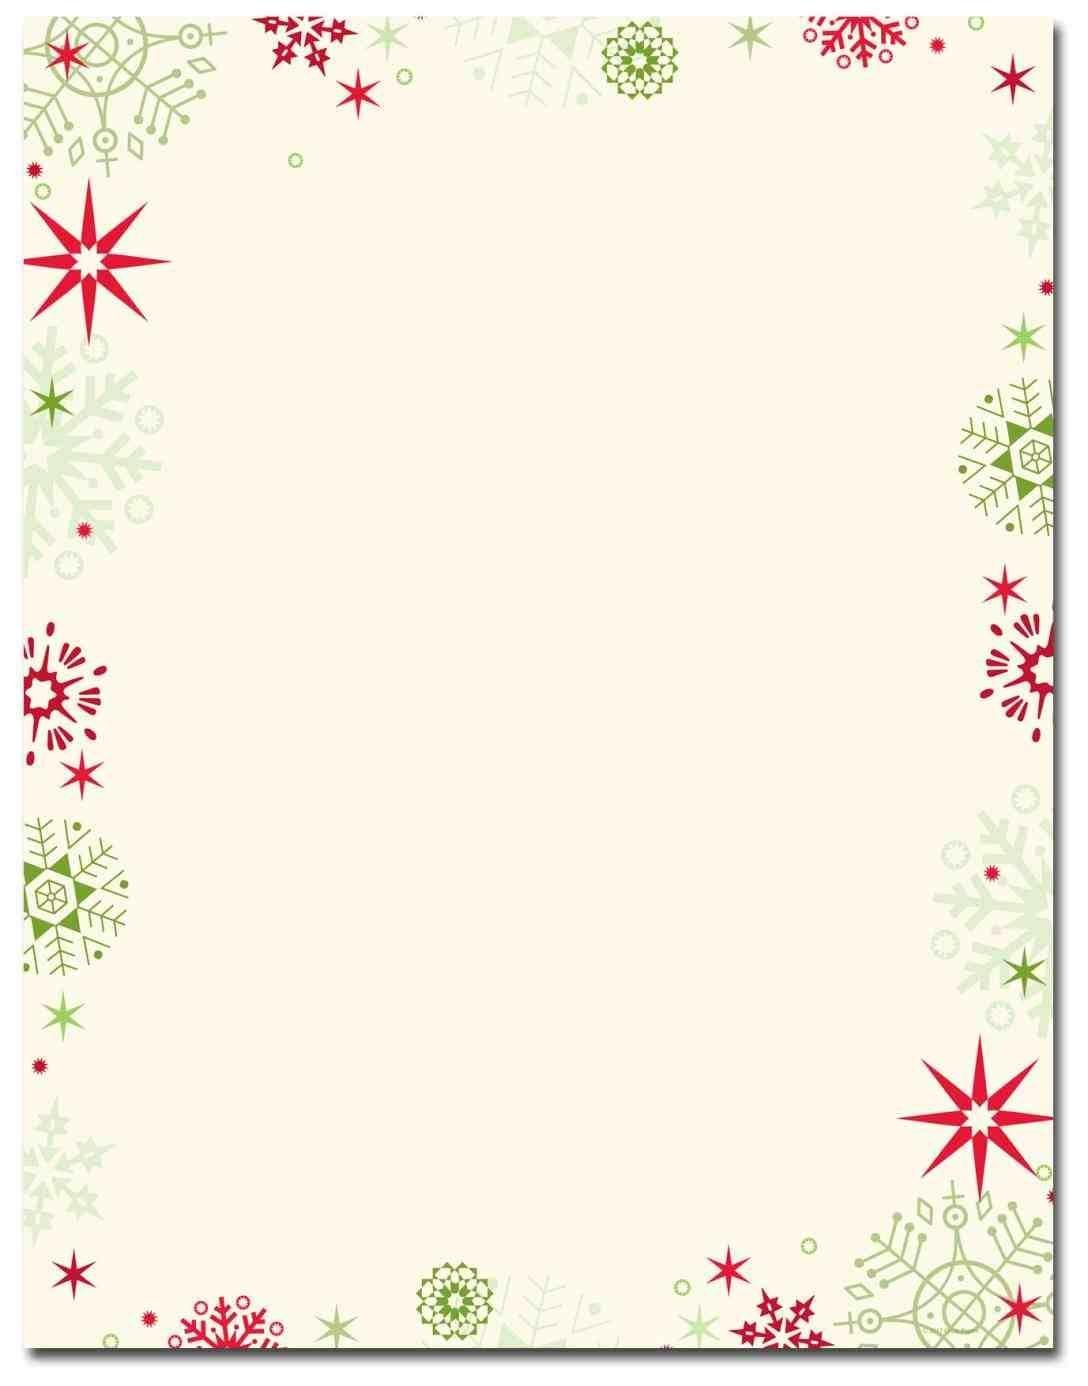 New Free Printable Christmas Stationary Borders At Temasistemi - Free Printable Letterhead Borders